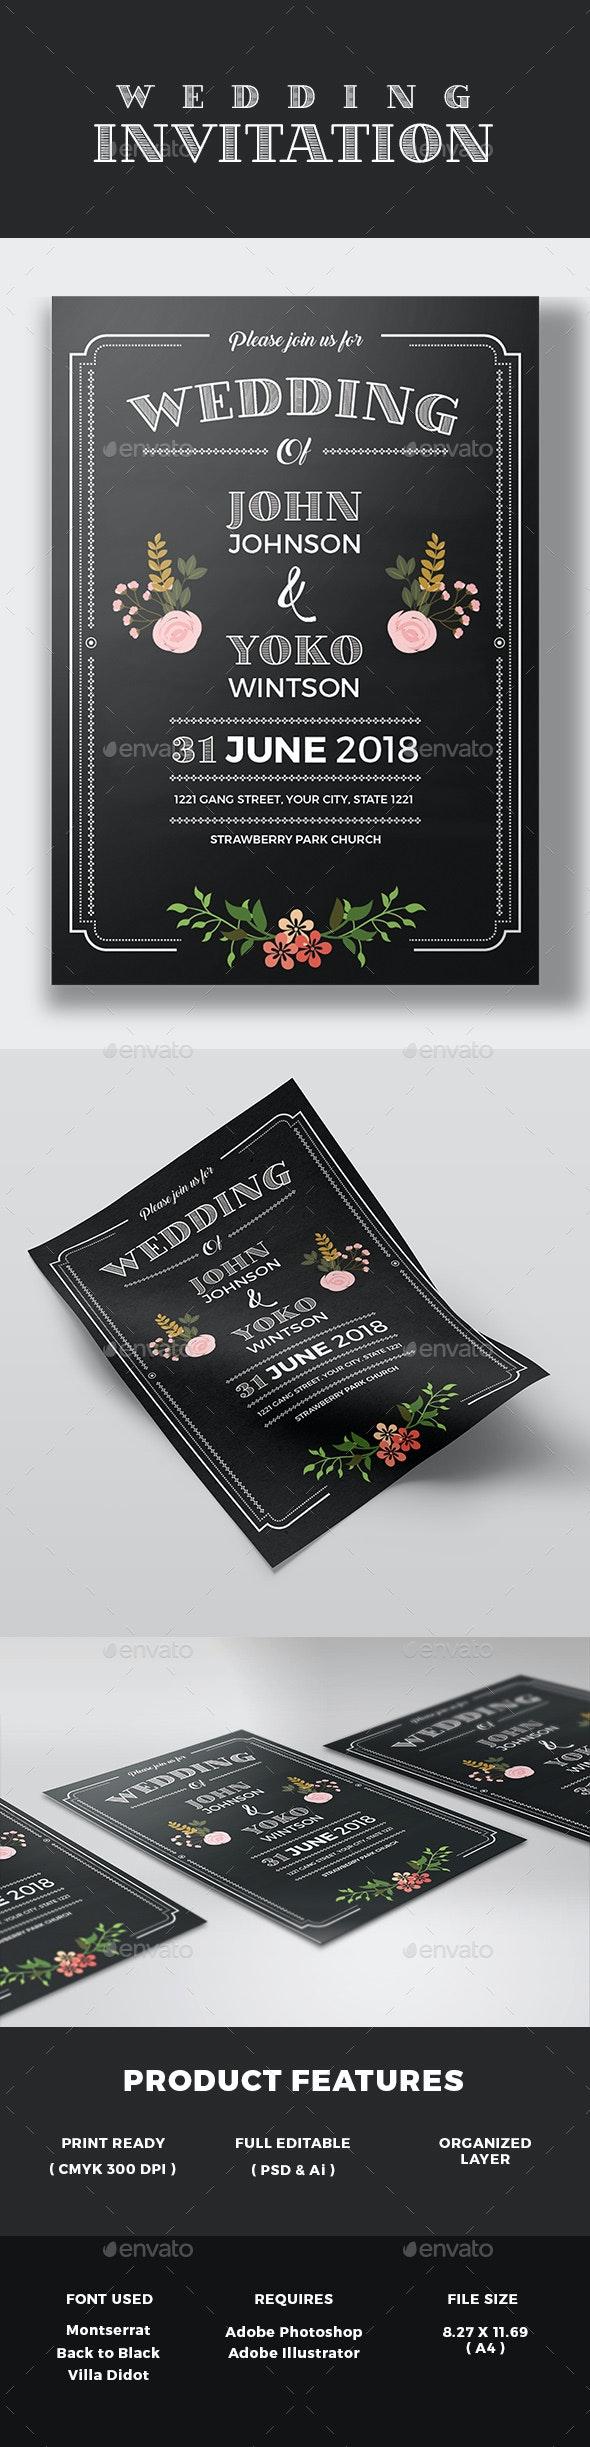 Chalkboard Style Wedding Invitation - Weddings Cards & Invites